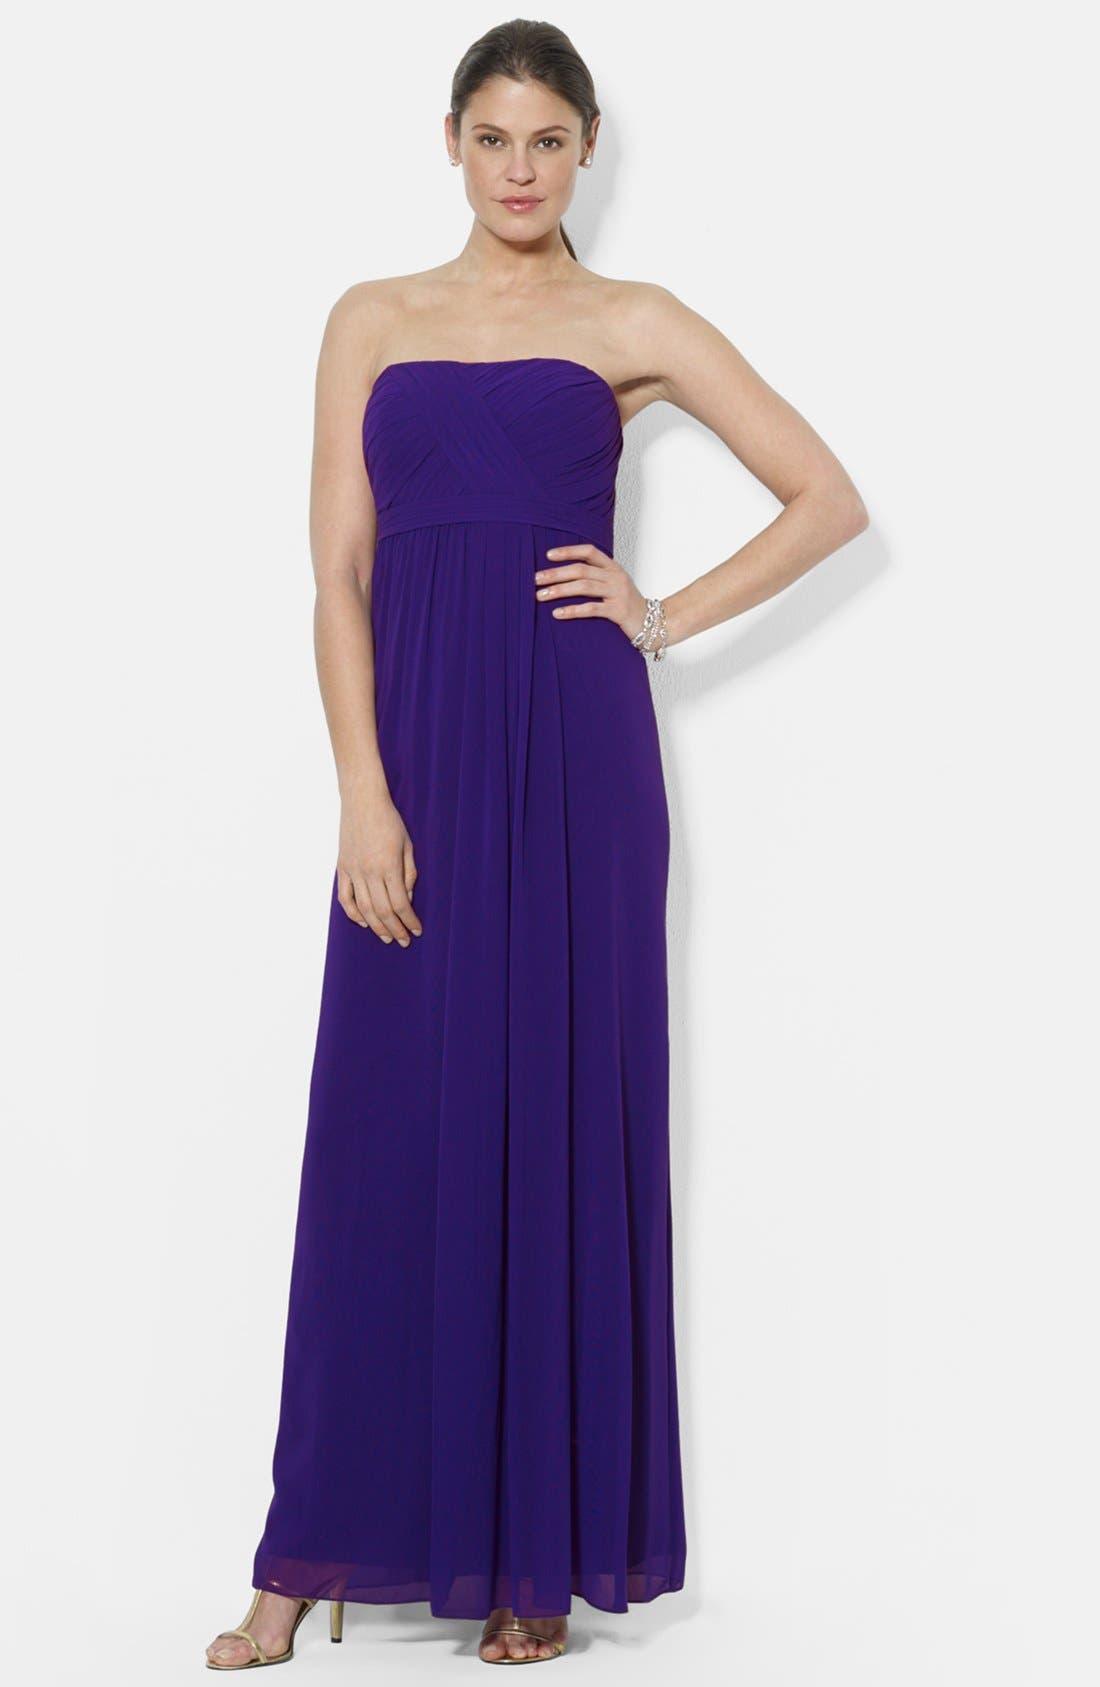 Alternate Image 1 Selected - Lauren Ralph Lauren Strapless Gathered Empire Gown